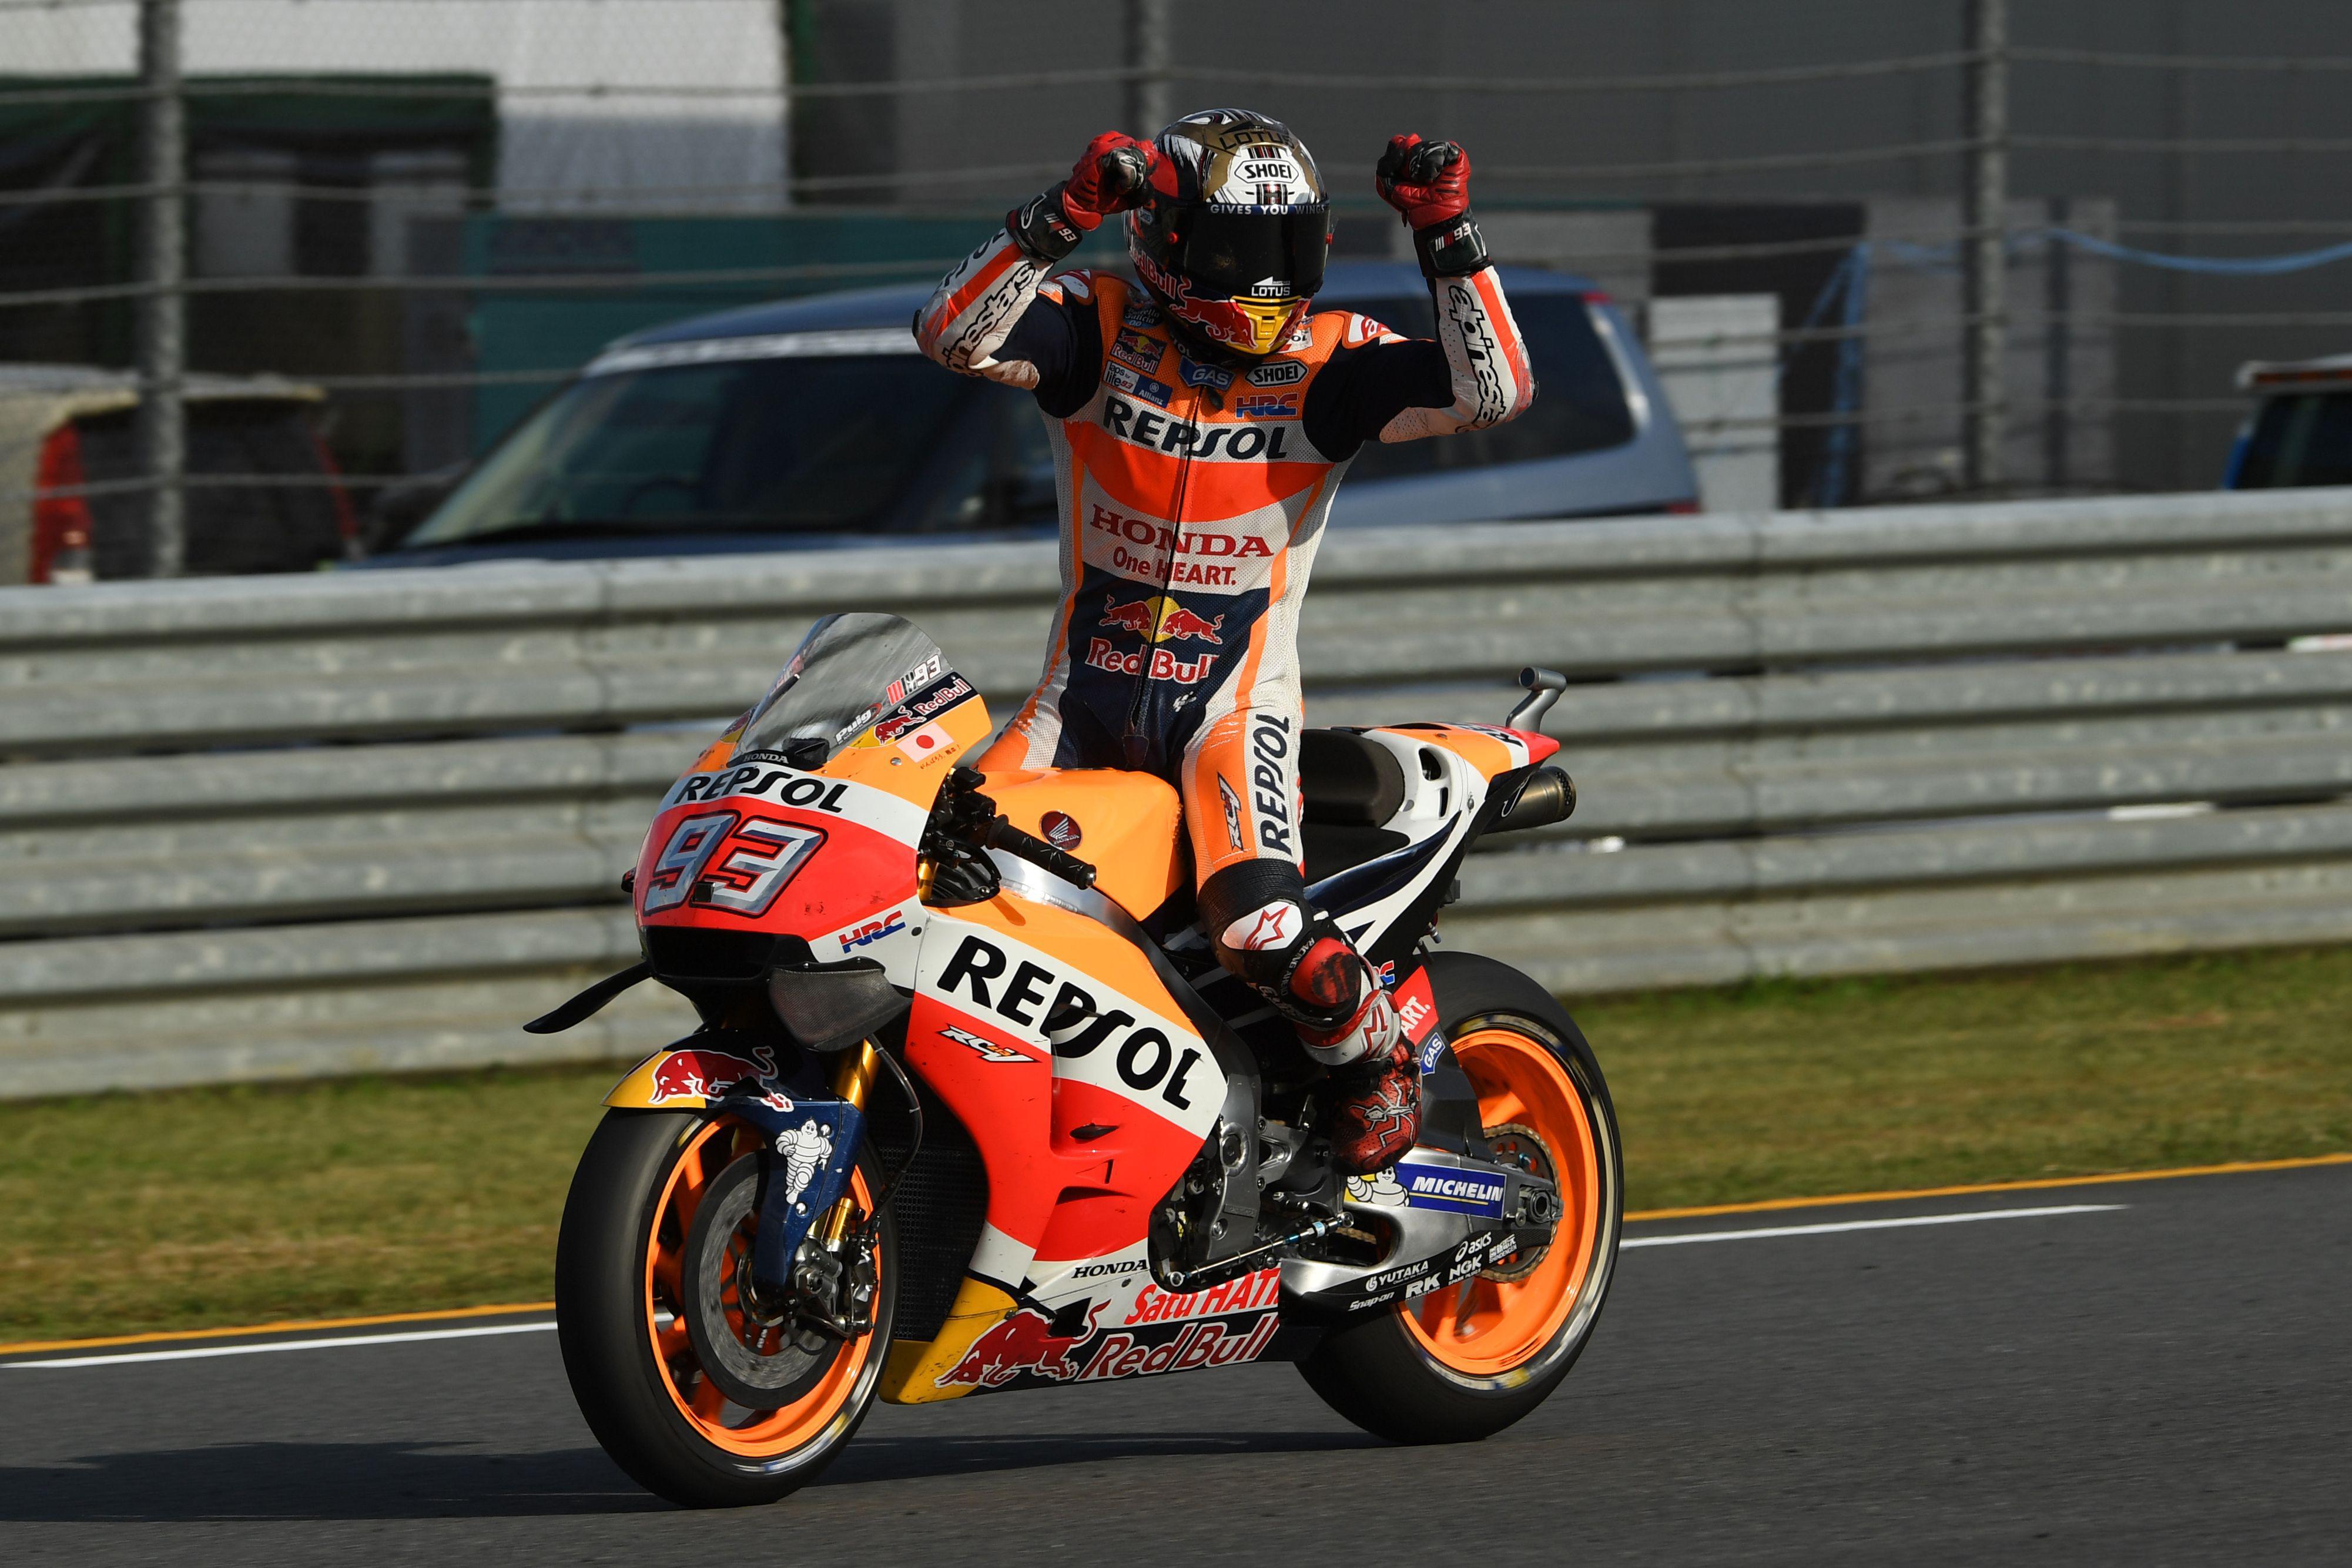 Auto/Moto - Rossi et Lorenzo chutent, Marquez redevient champion du monde